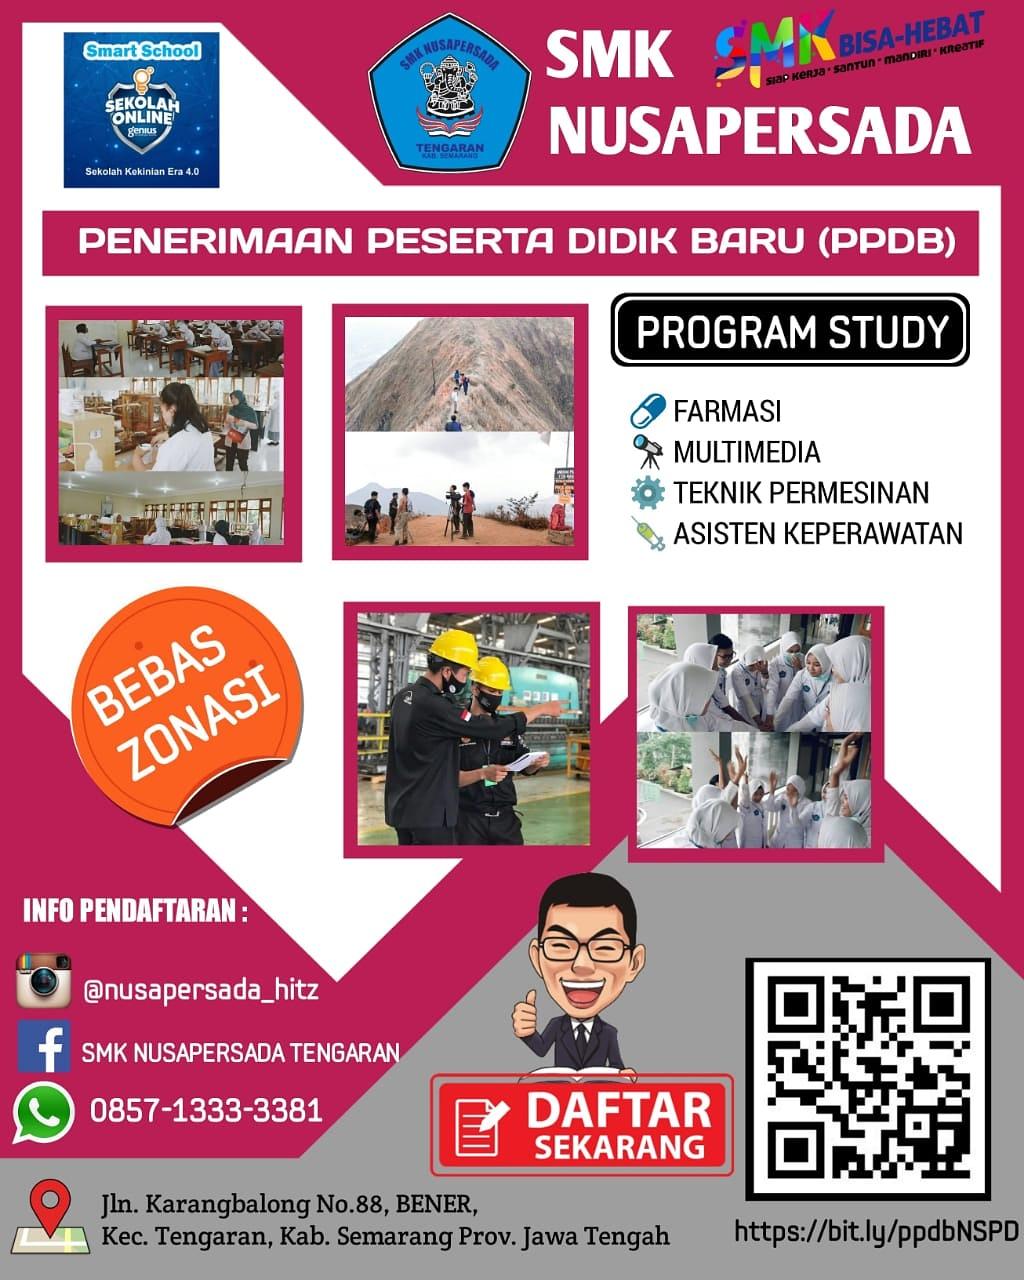 SMK Nusapersada, Presentasi PPDB di SMKN 1 Tuntang